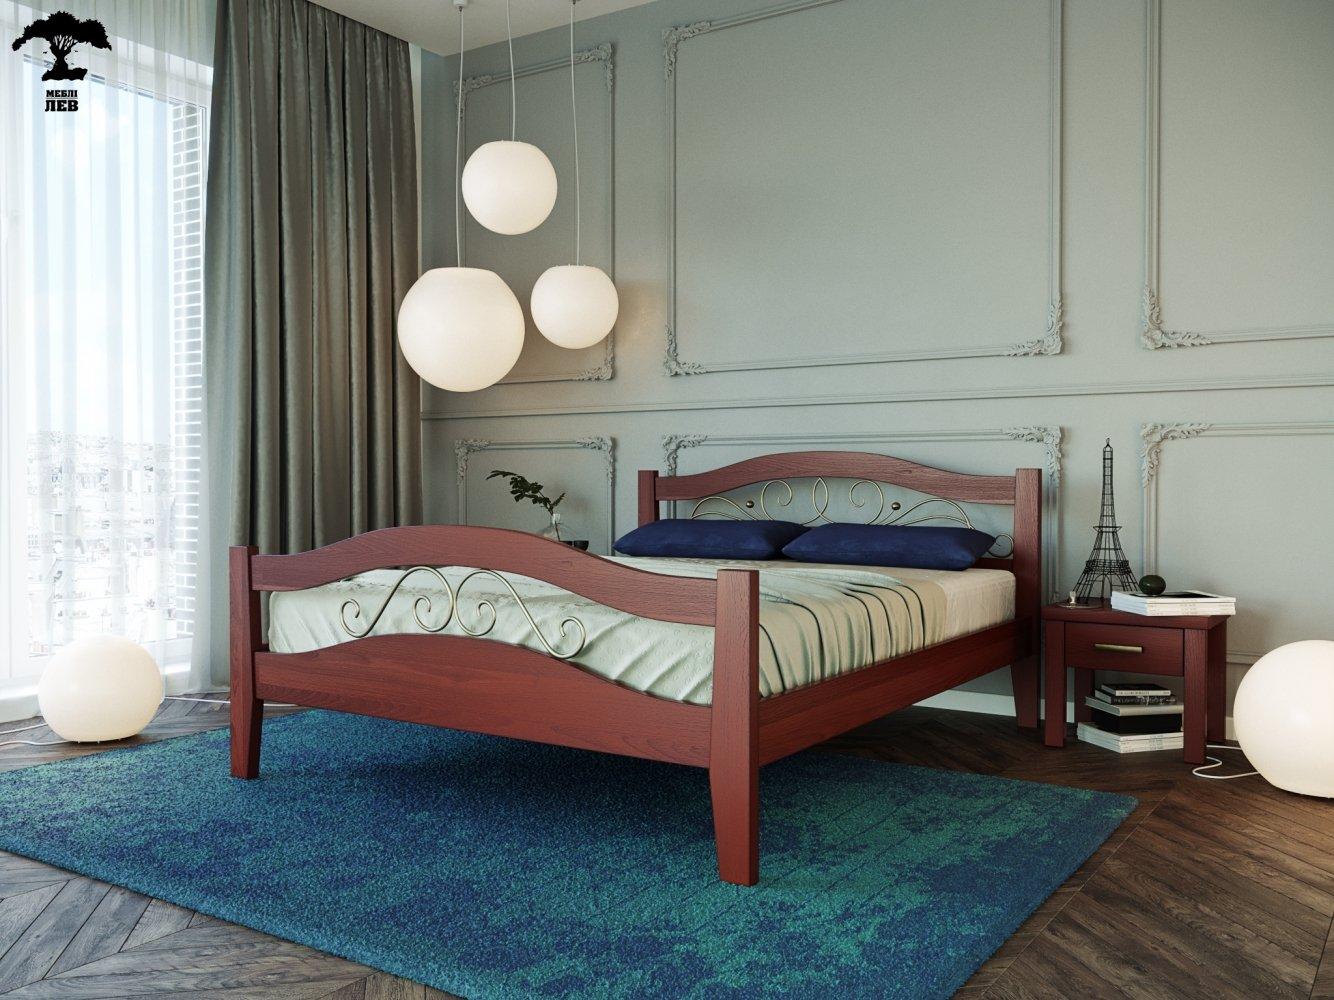 Ліжко Афіна-2 Лев 1